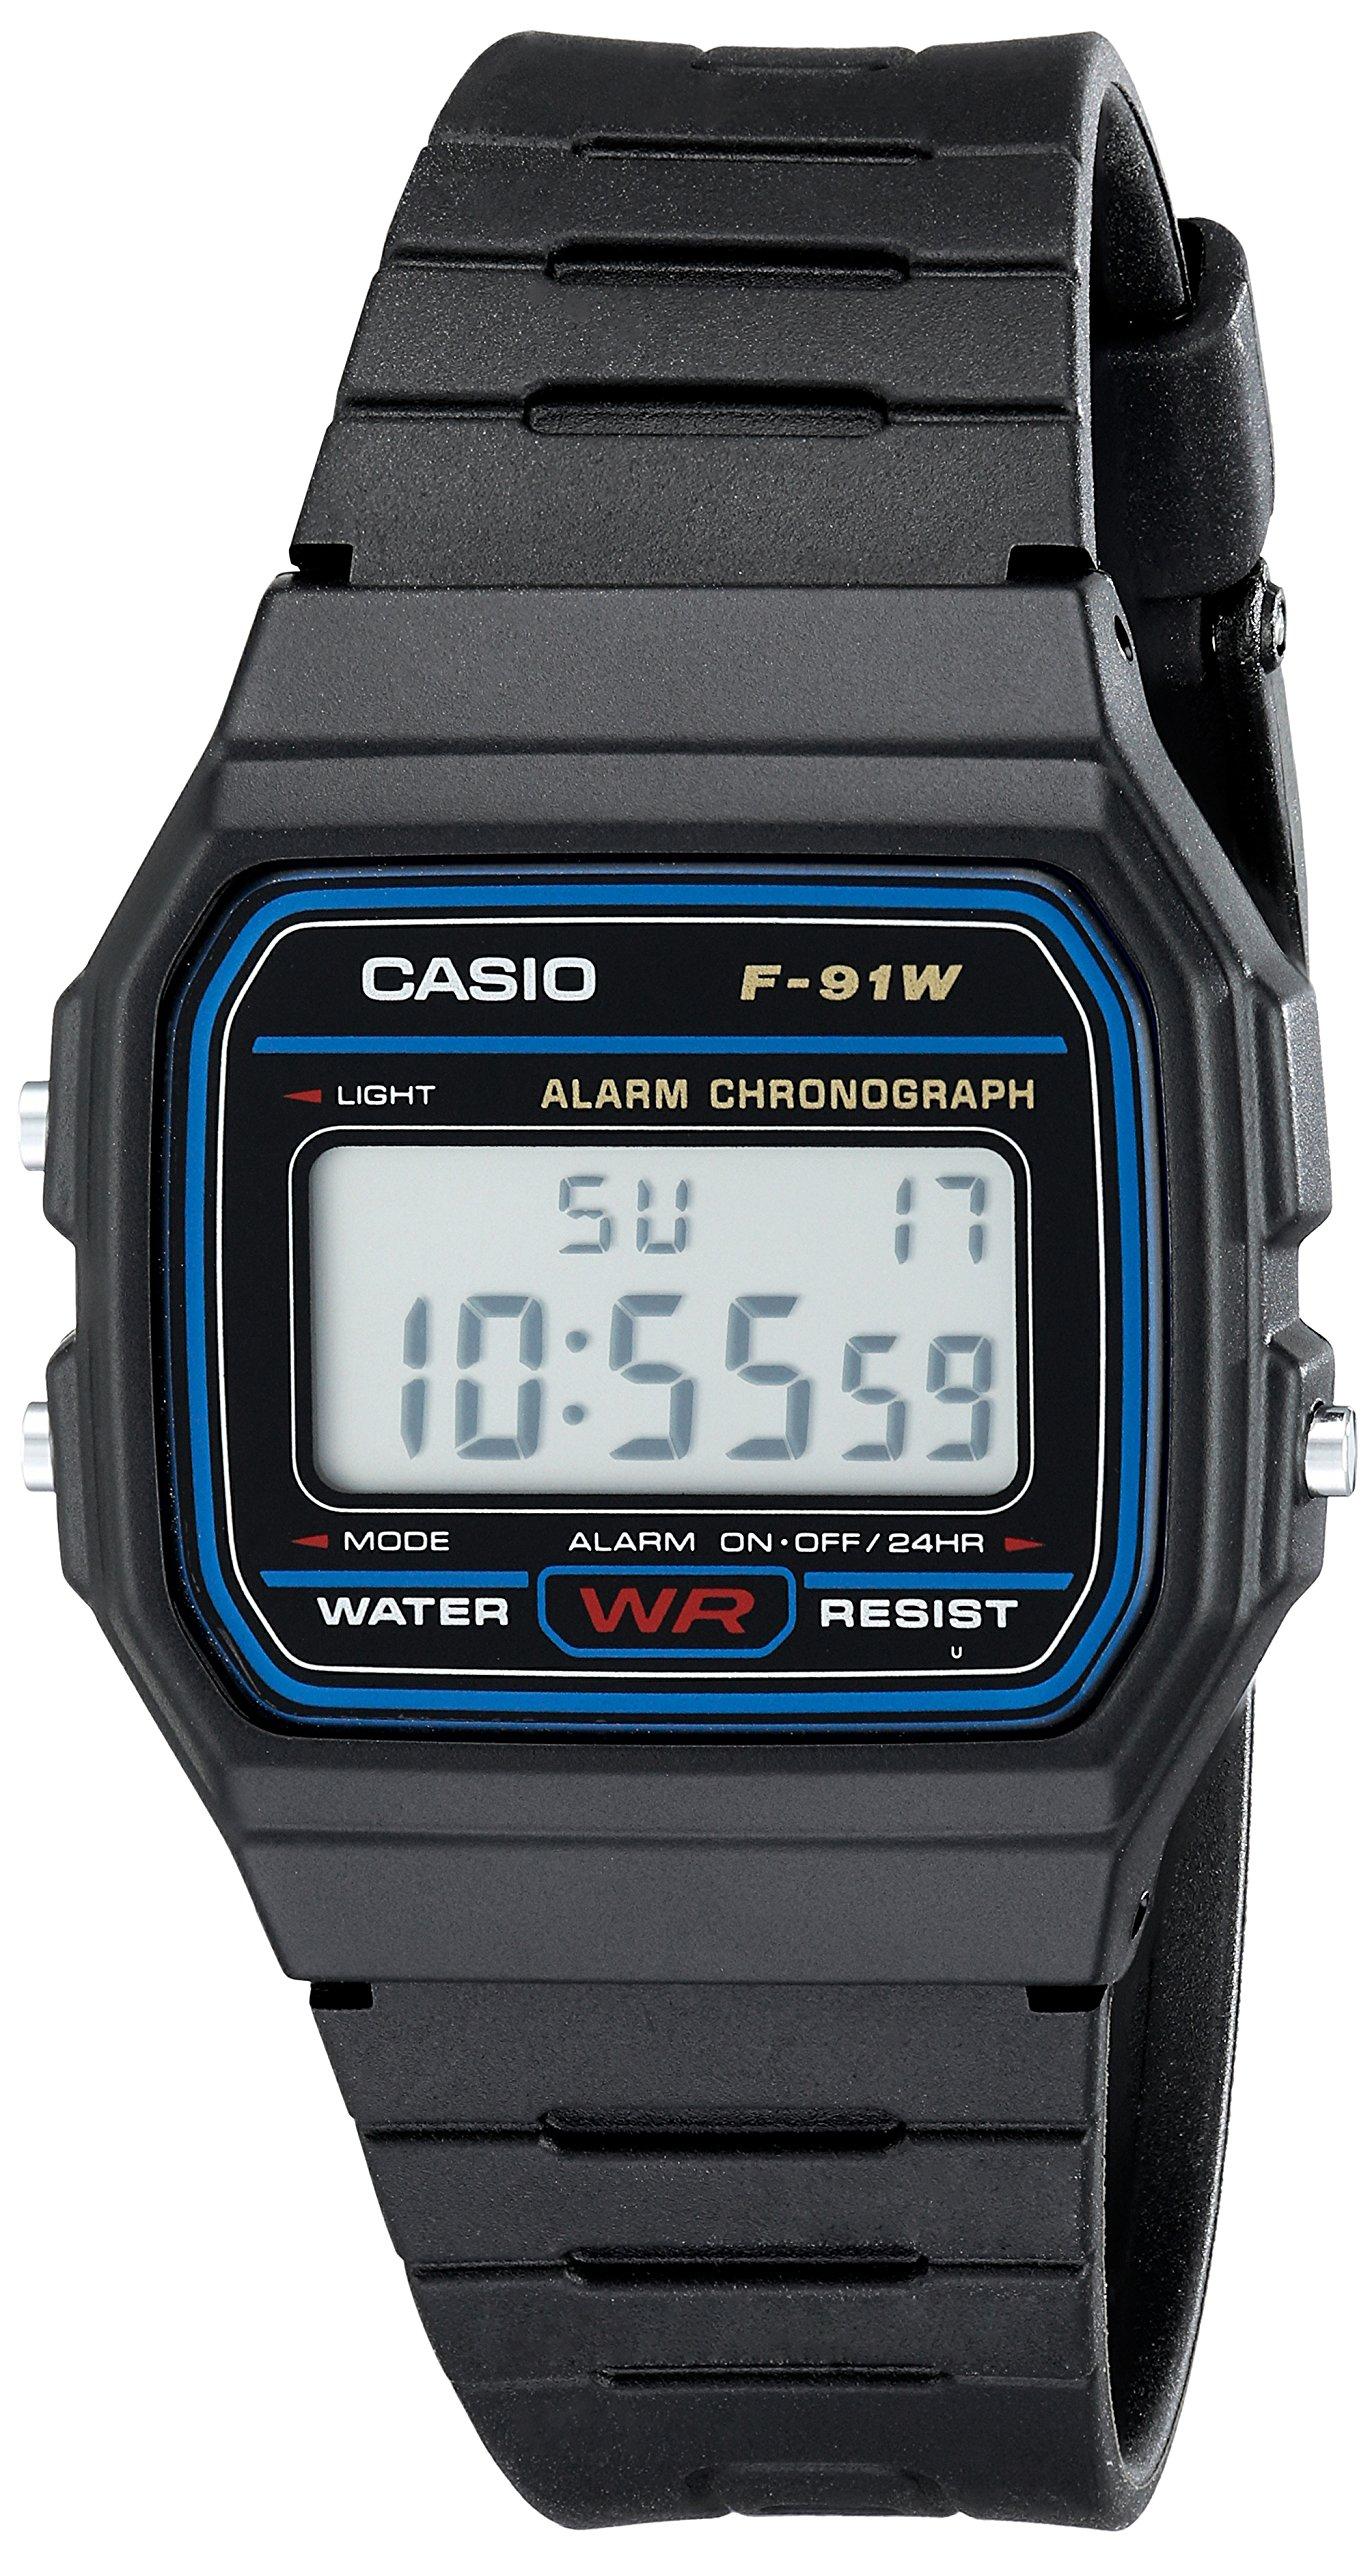 Casio F91W Digital Sports Watch product image